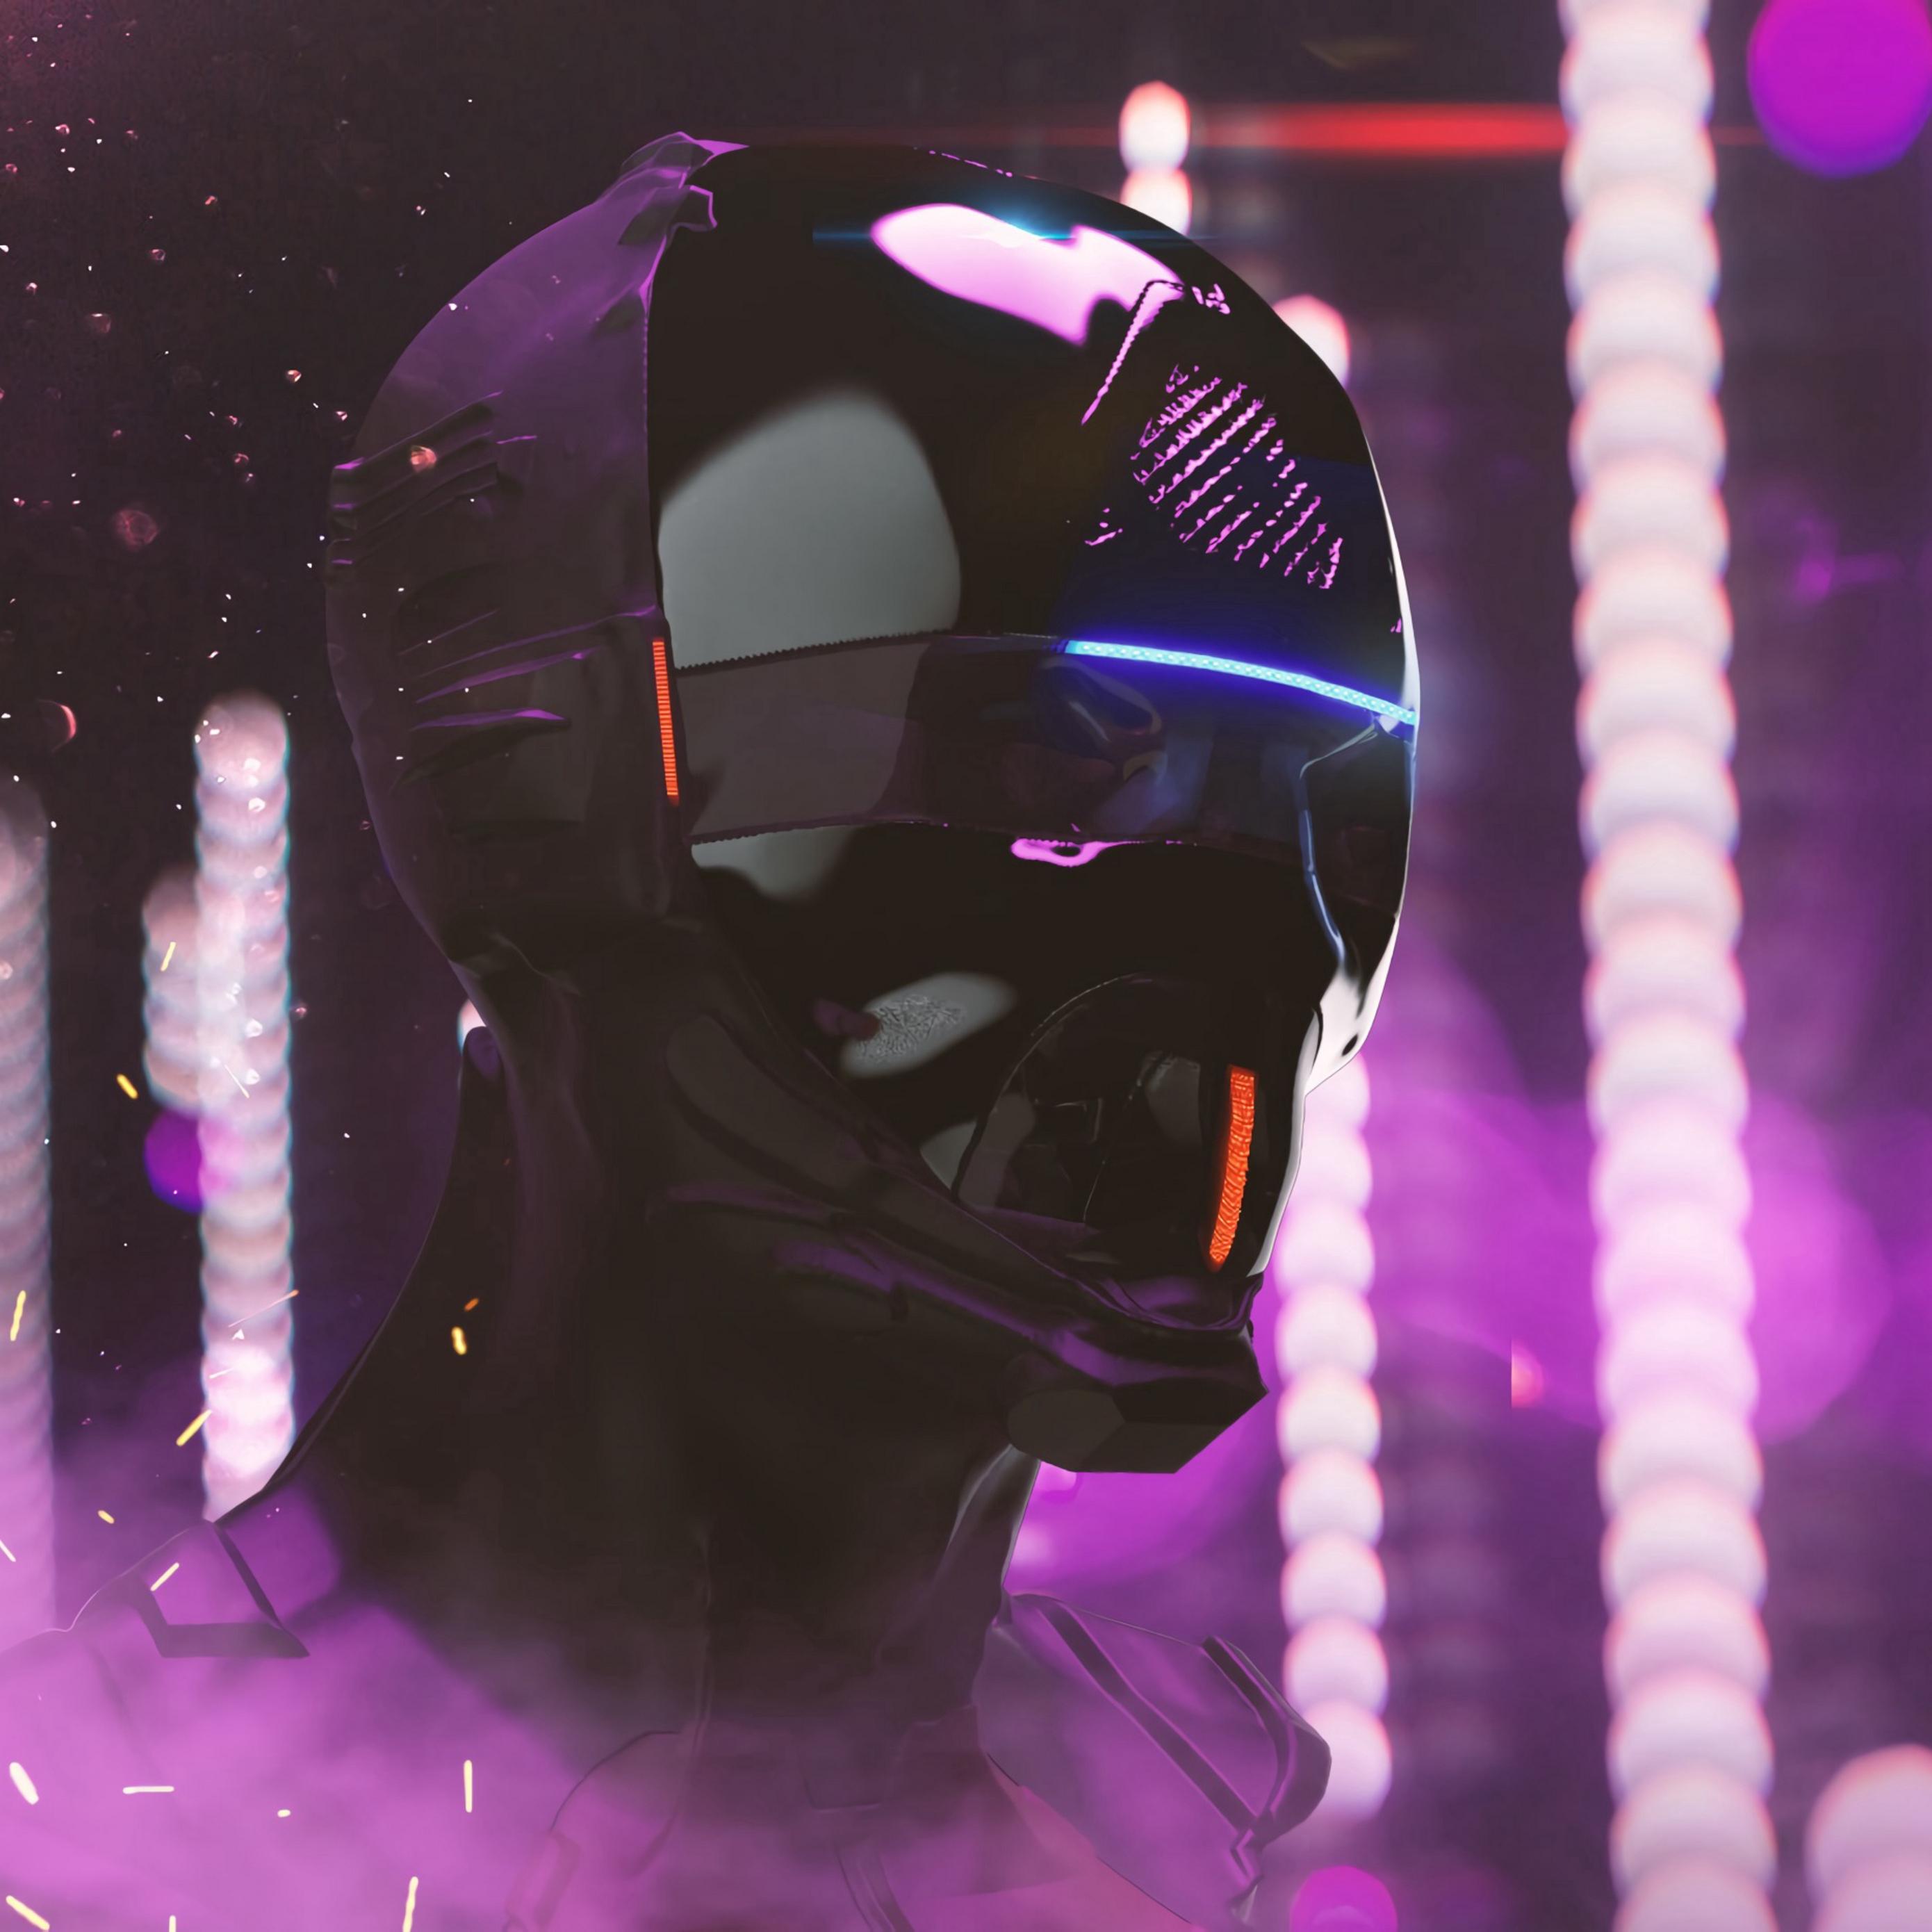 Download wallpaper 2780x2780 mask helmet cyberpunk robot neon 2780x2780